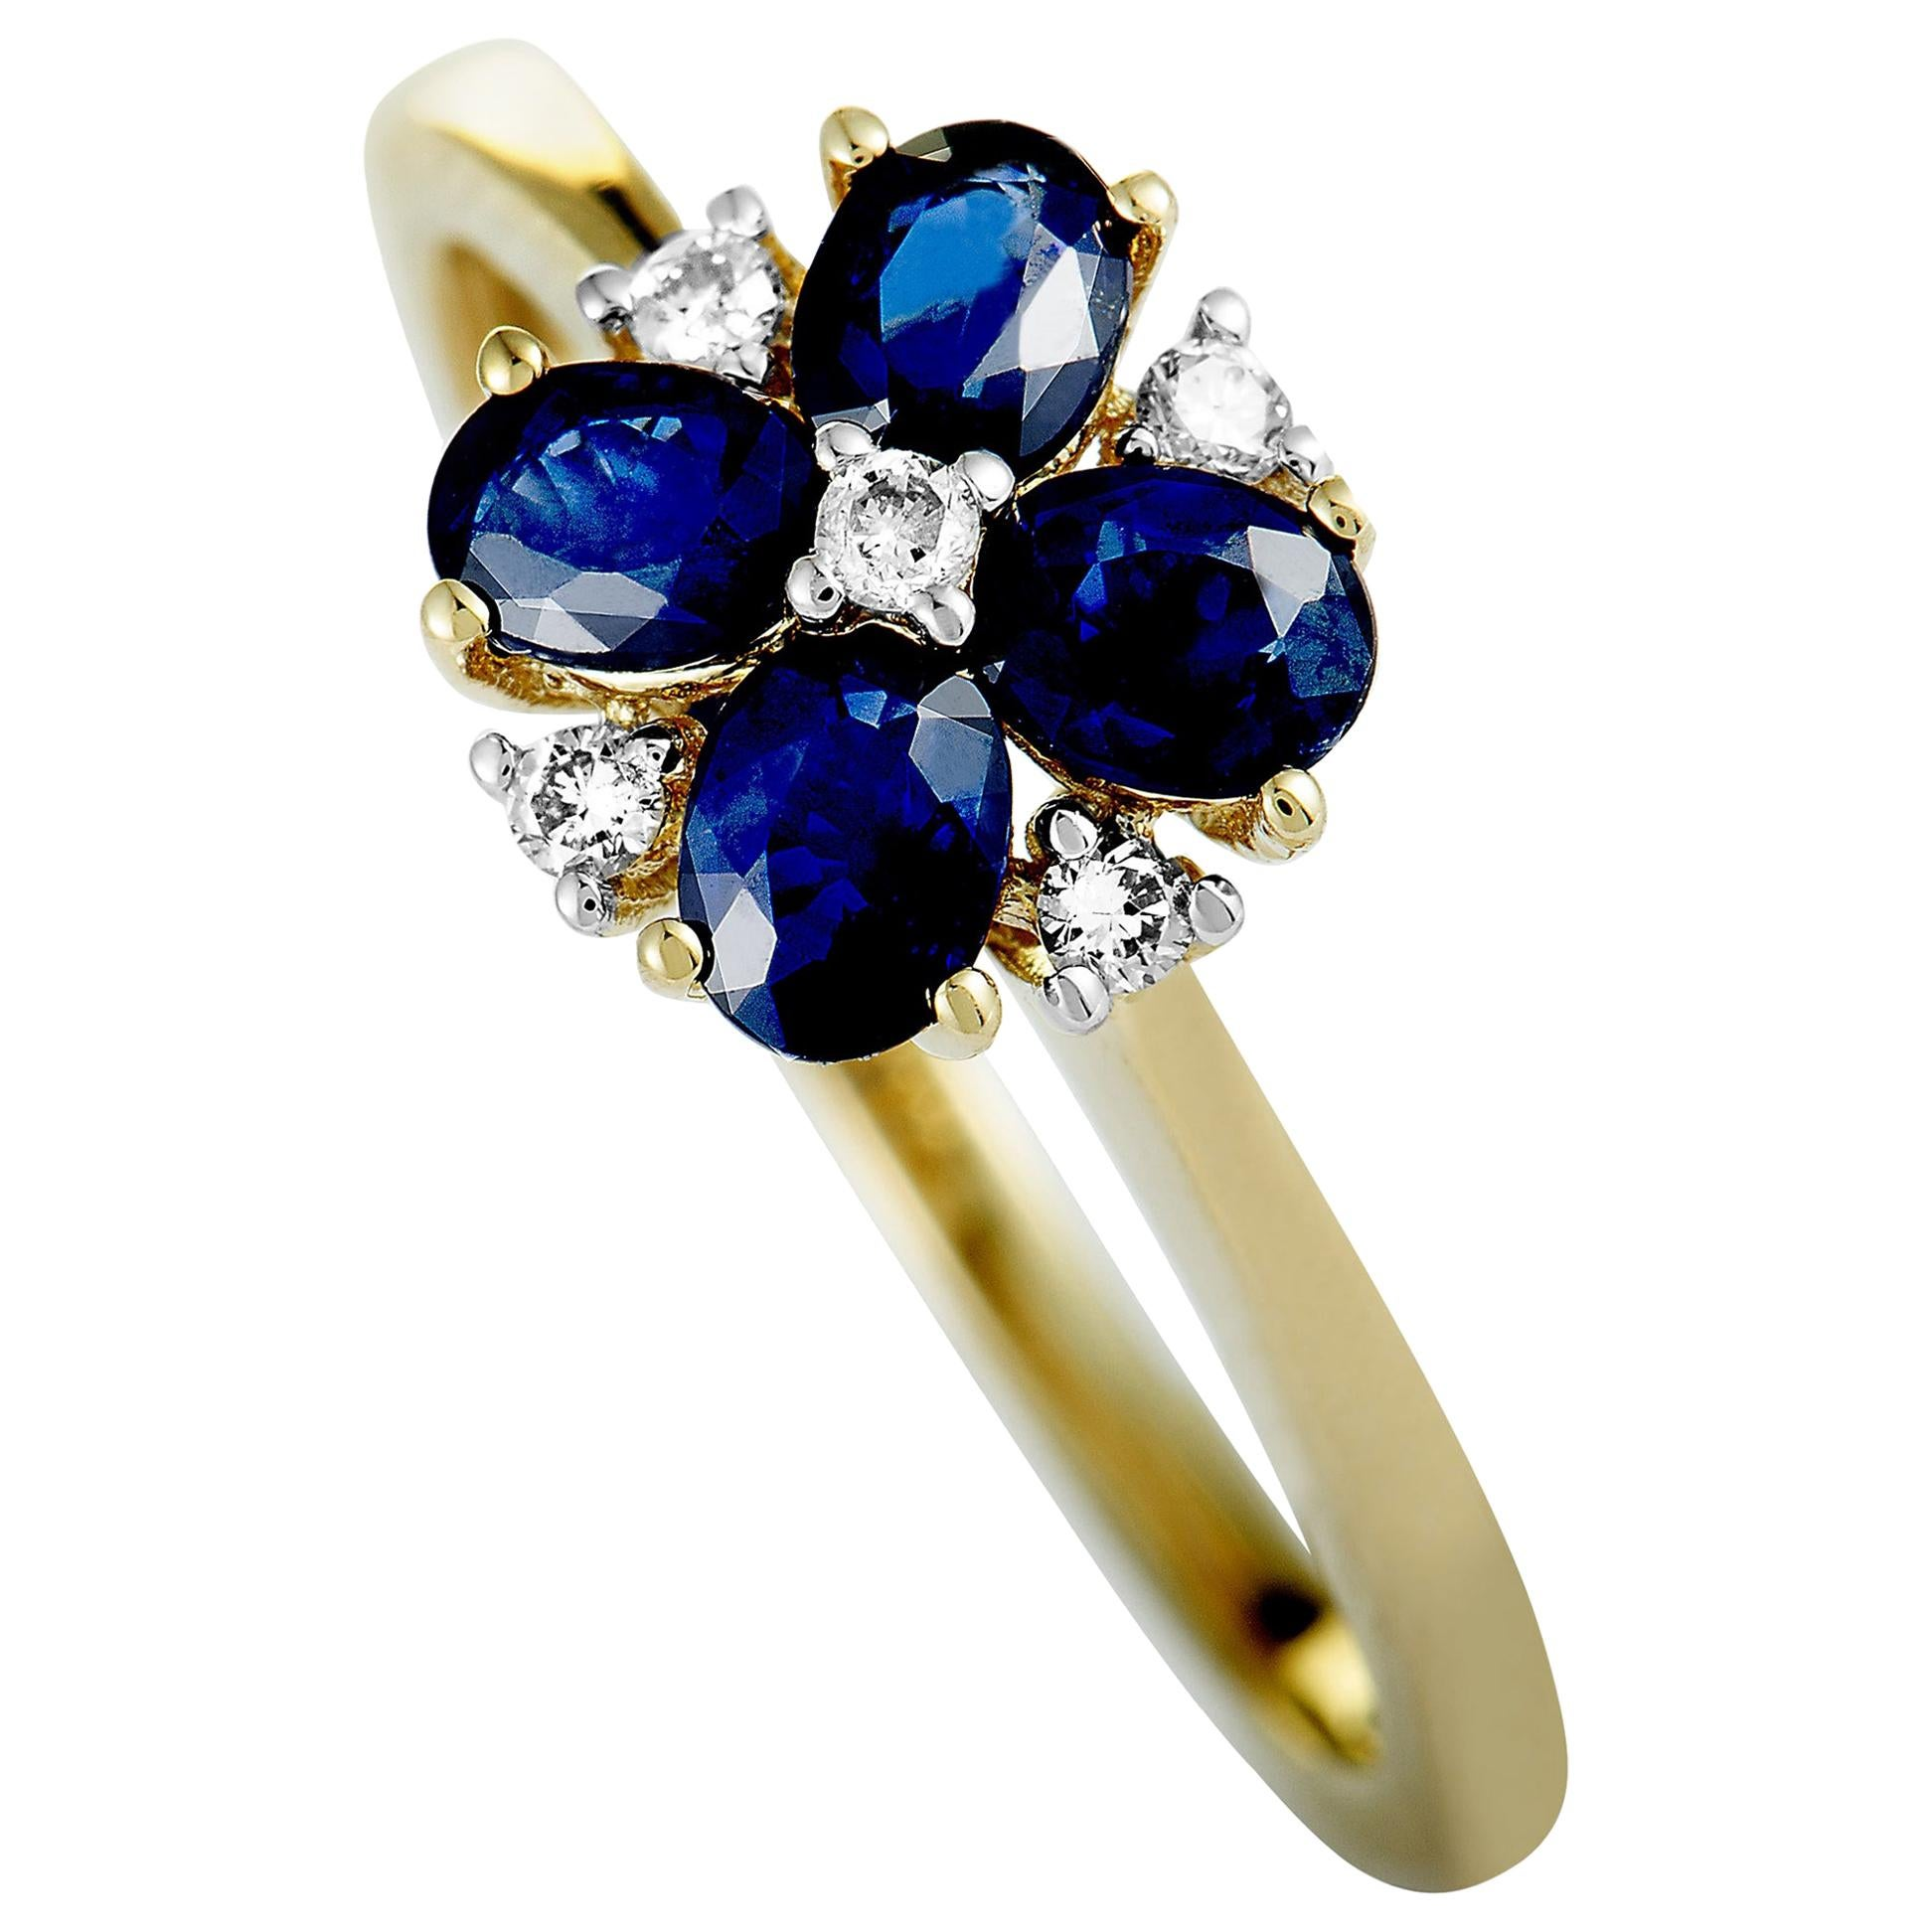 14 Karat Yellow Gold Diamond and Sapphire Flower Ring